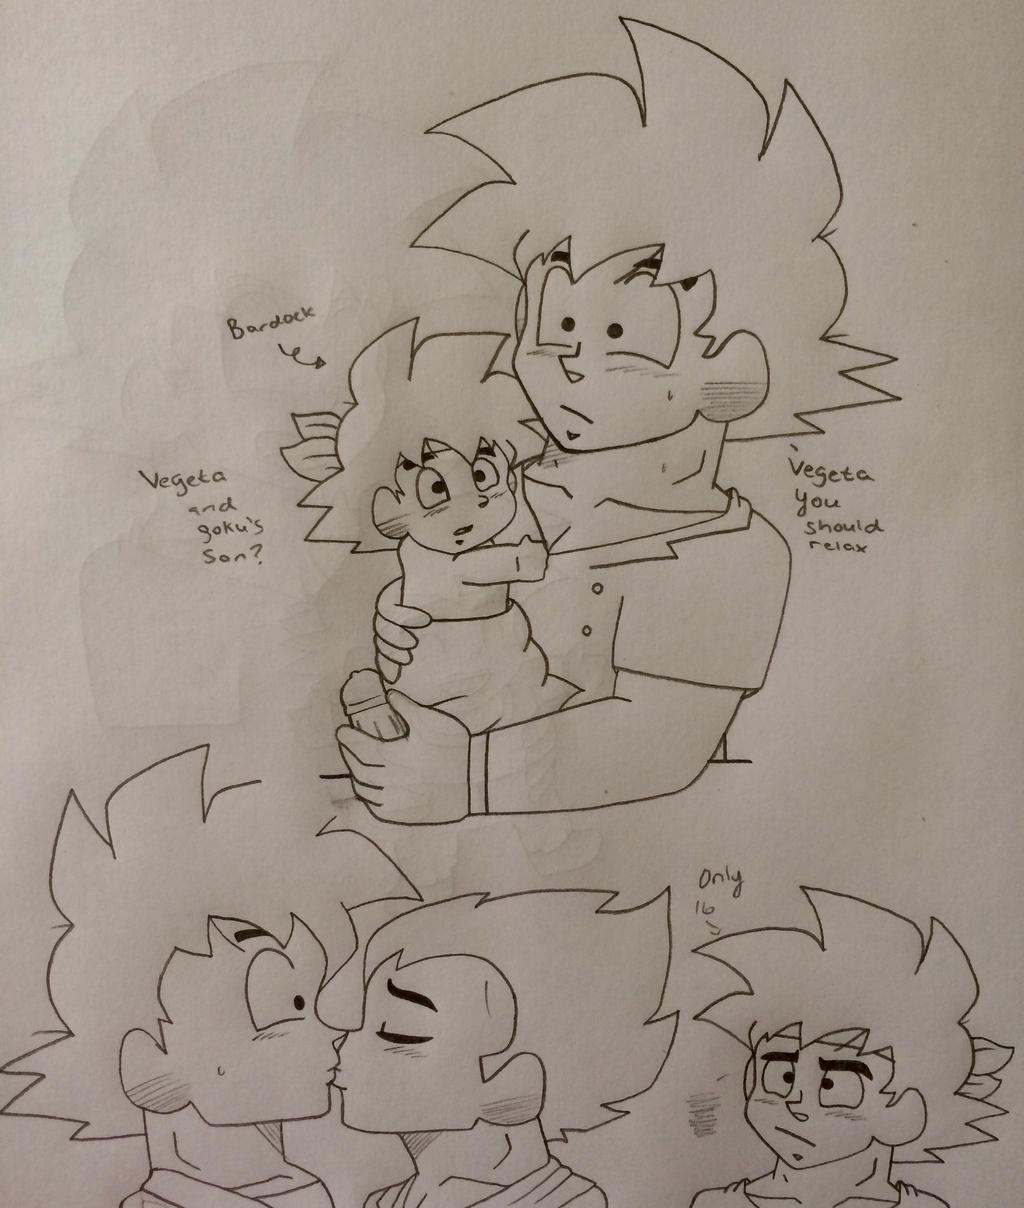 bardock and his loving parents vegeta and goku by Ashartz123